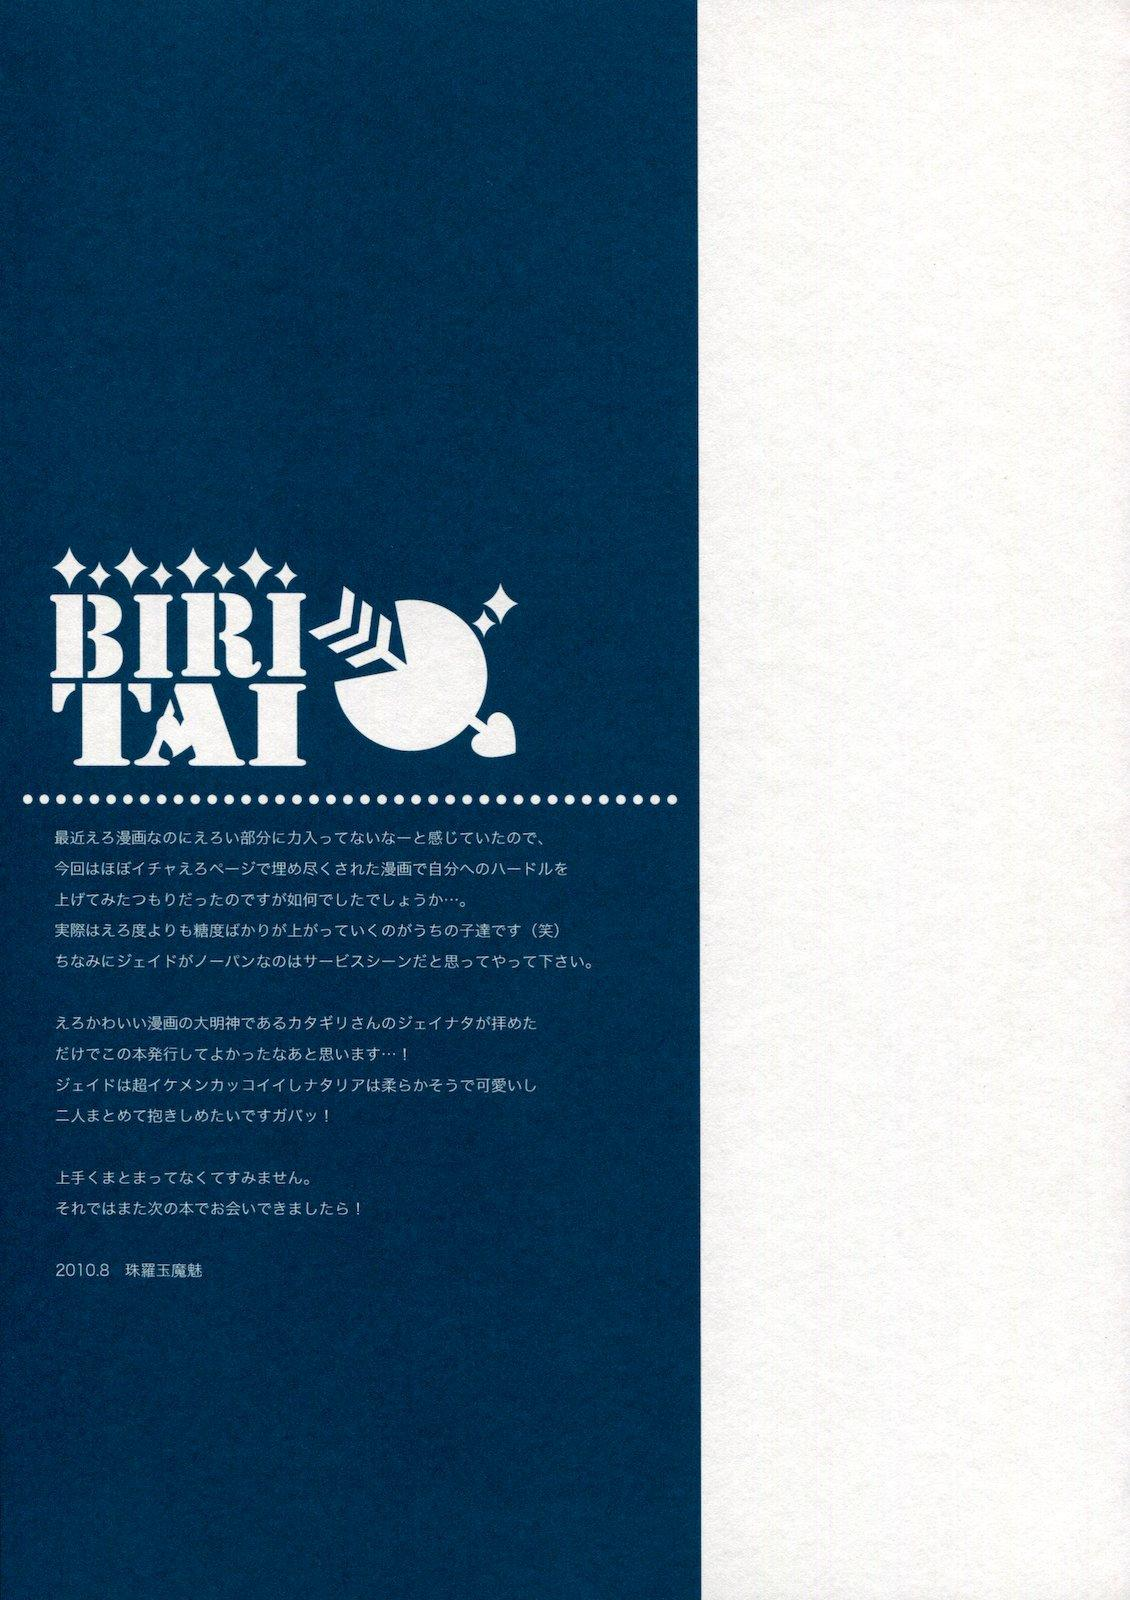 BIRITAI 47